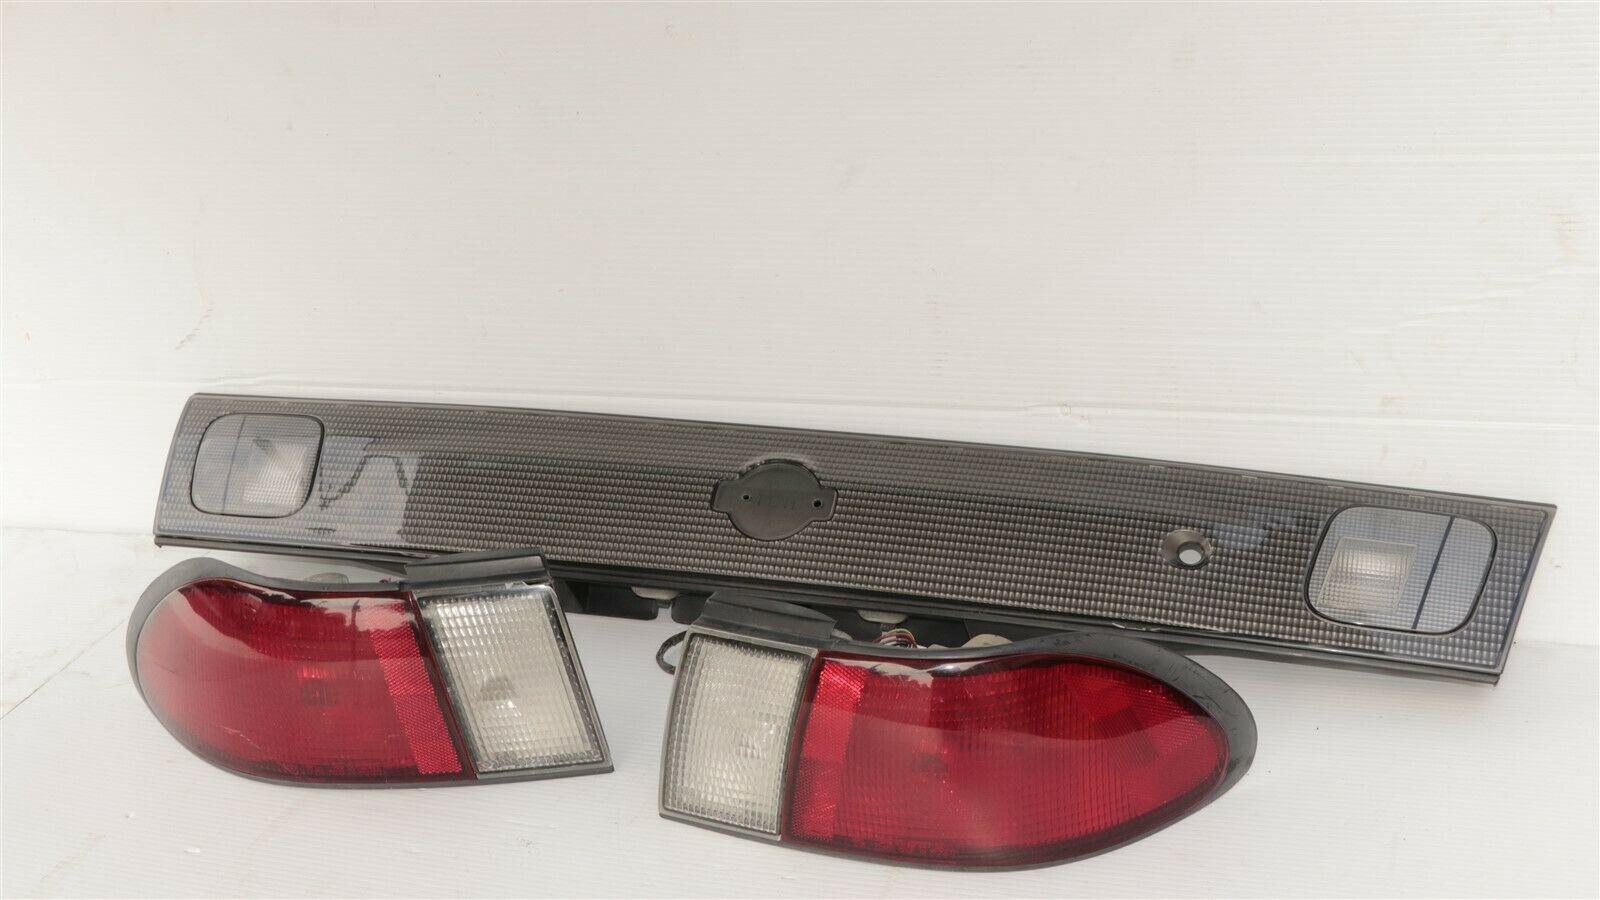 98-99 Nissan Sentra B14 Tail Lights & Center Reflector Panel Carbon Fiber Look